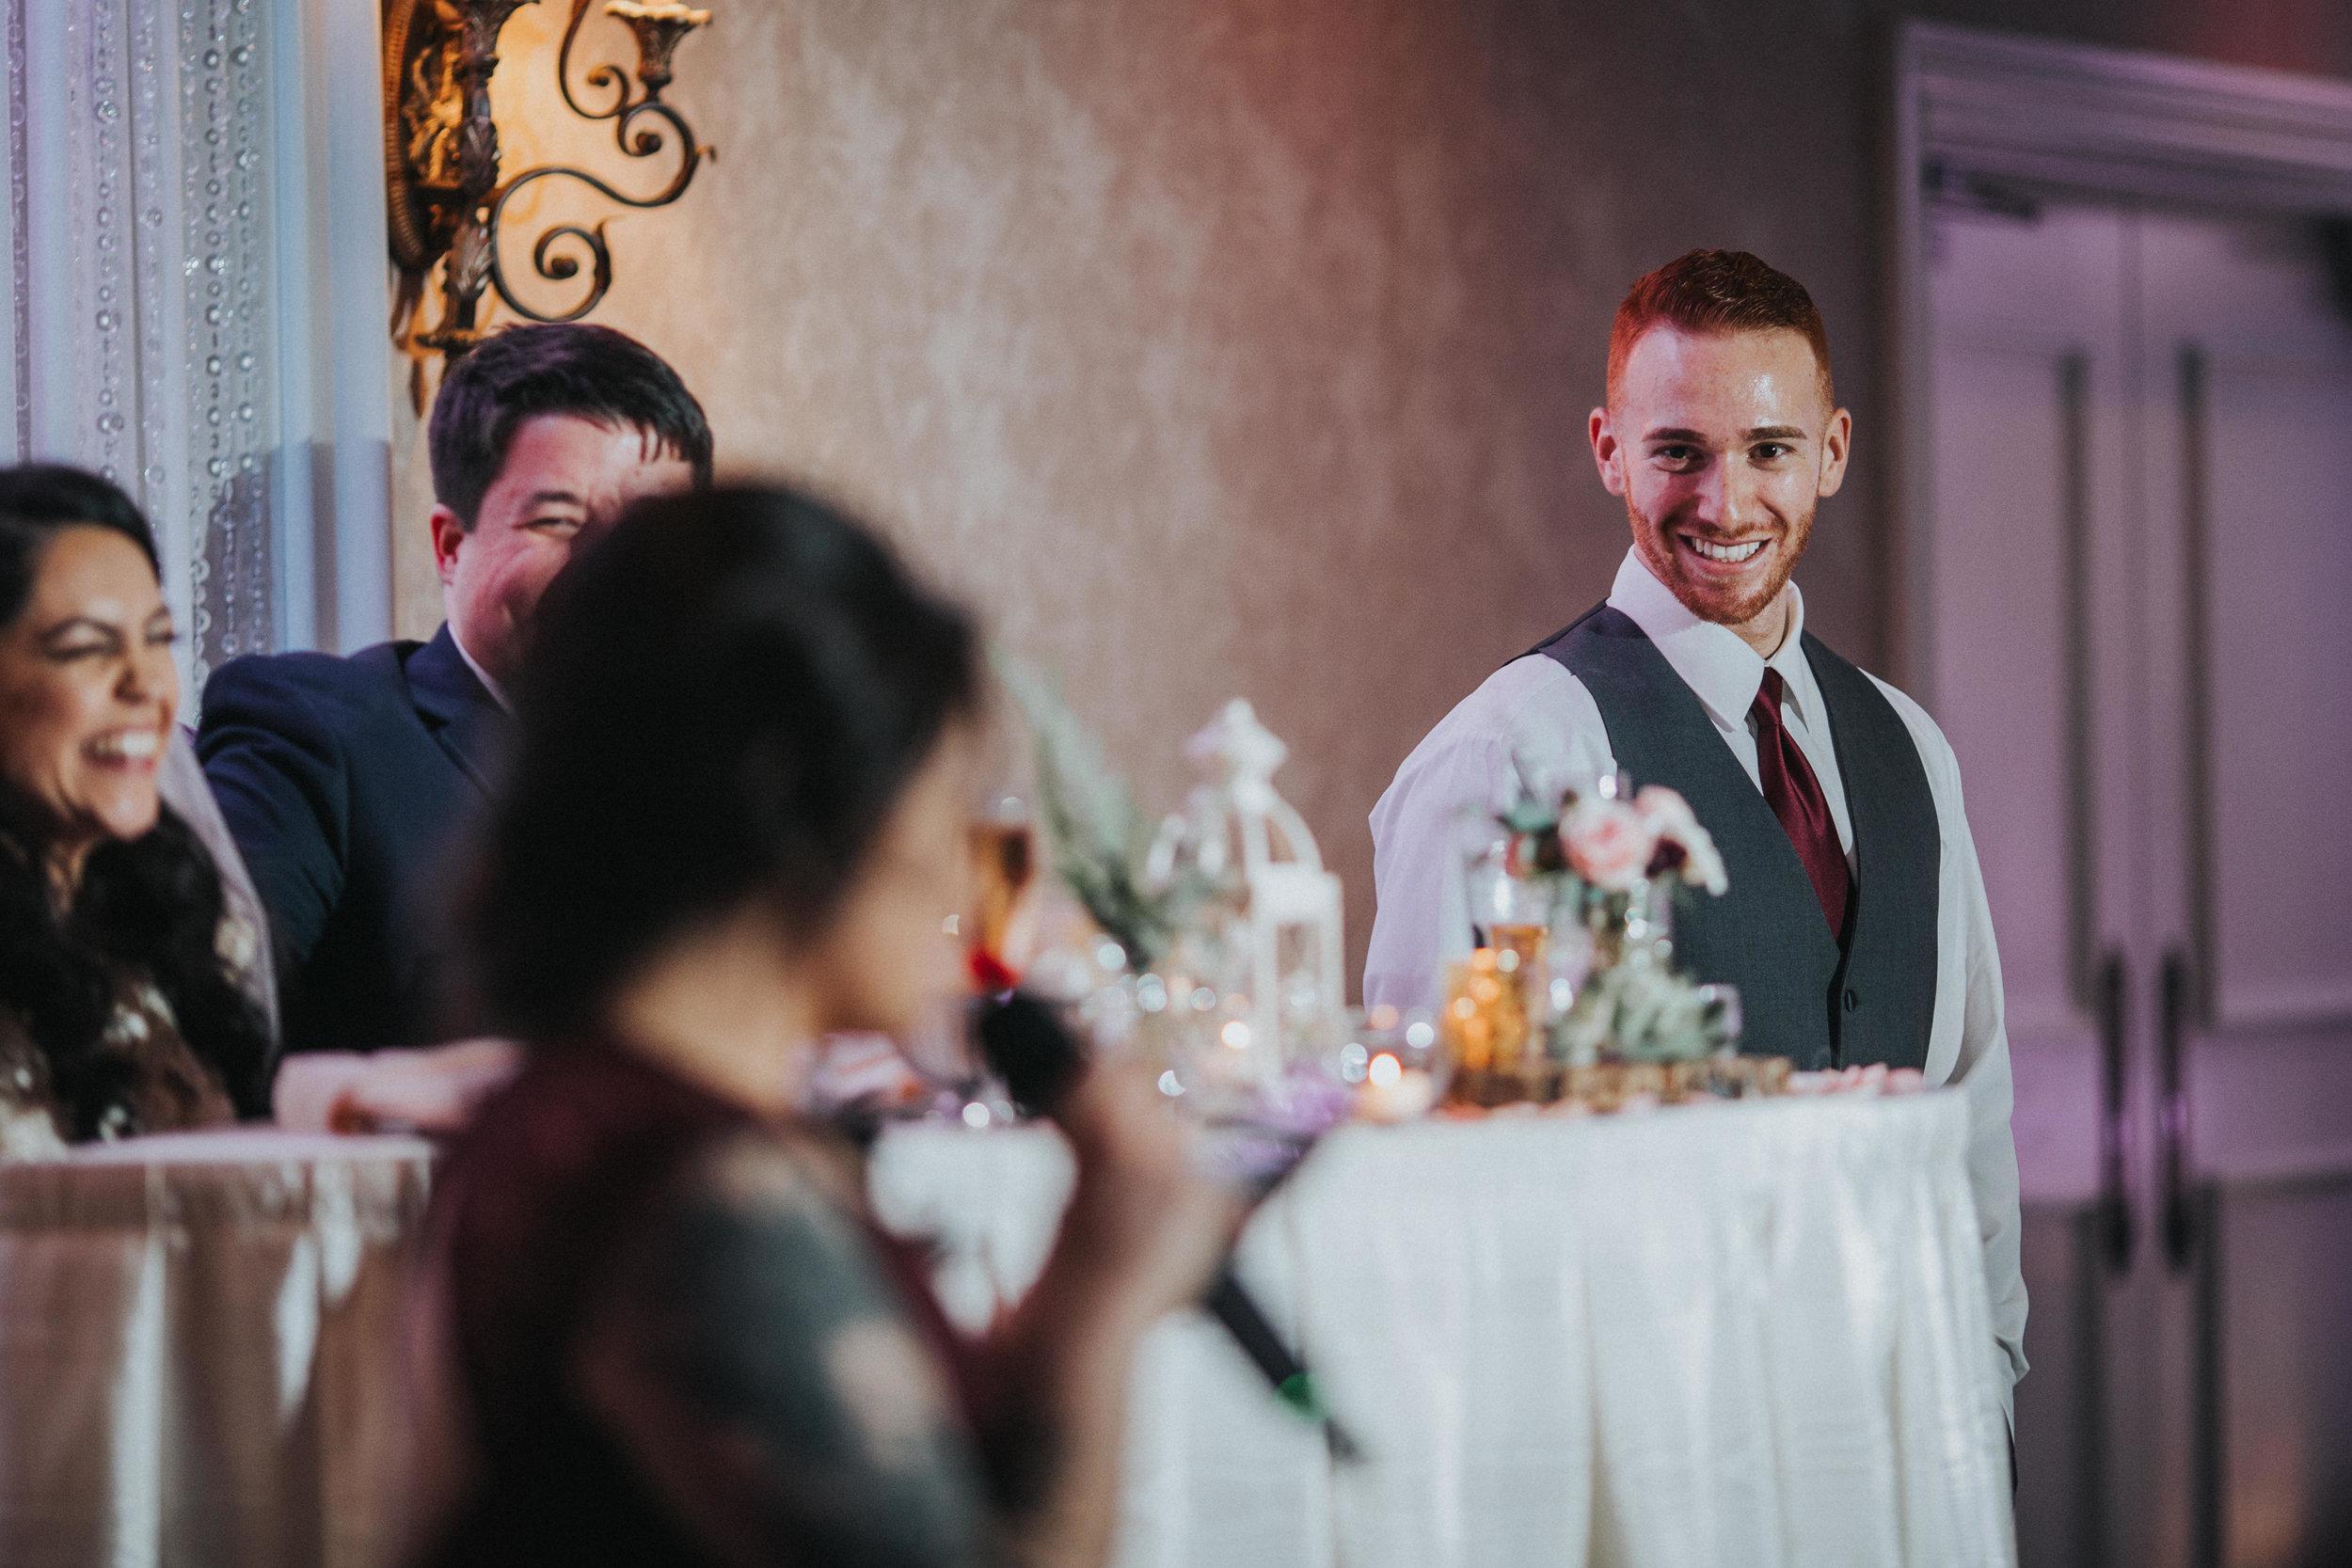 New-Jersey-Wedding-Photographer-ReceptionCenter-Valeria&Mike-Reception (47 of 265).jpg